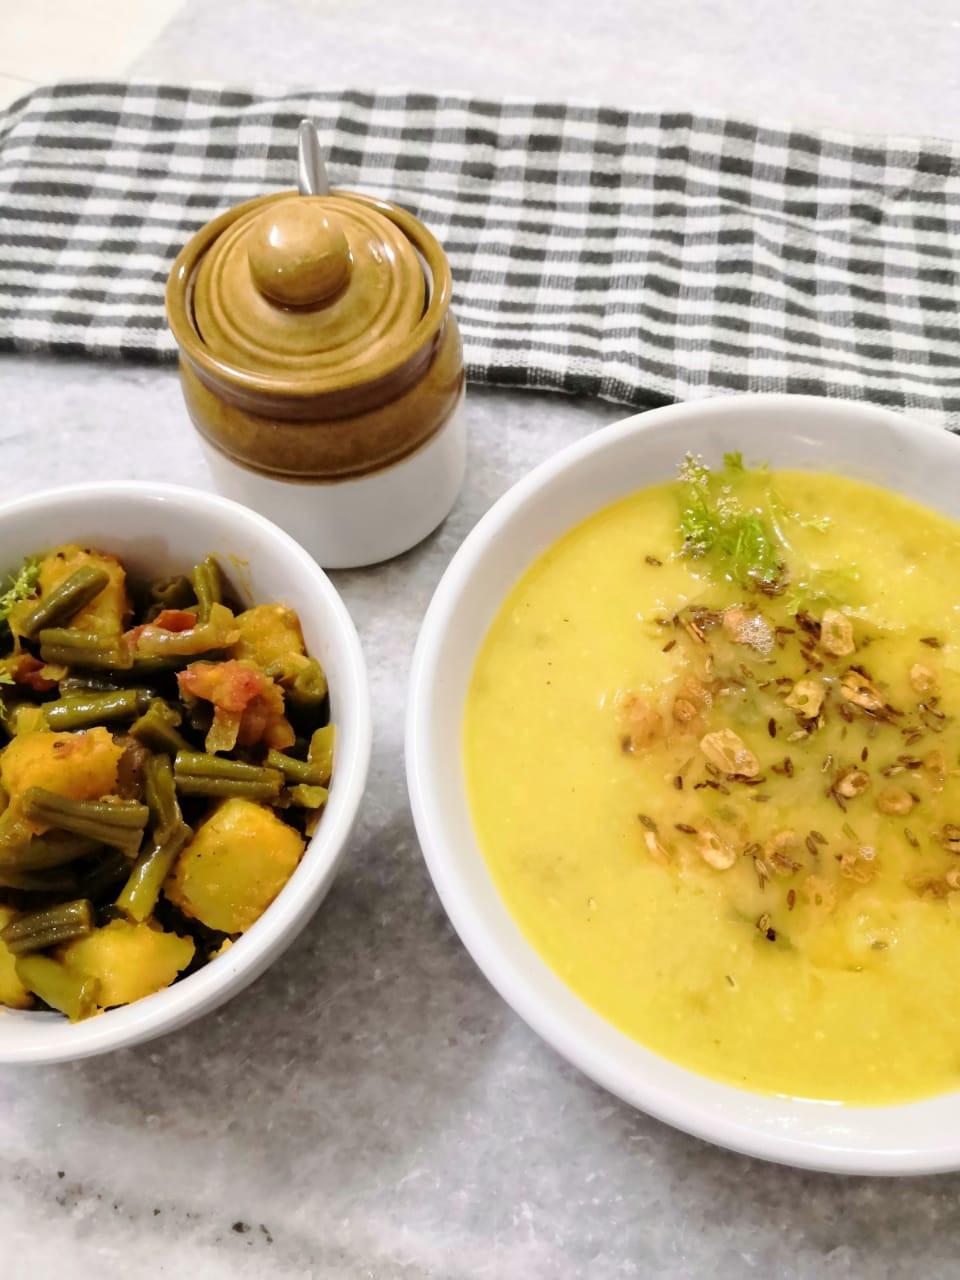 indian meal ideas, basic moong dal tadka recipe, quick and easy moong moong dal tadka recipe, simple indian meal recipe, lasuni moong dal tadka recipe, traditional indian food recipe blog WhiskMixStir, Sheetal Jandial